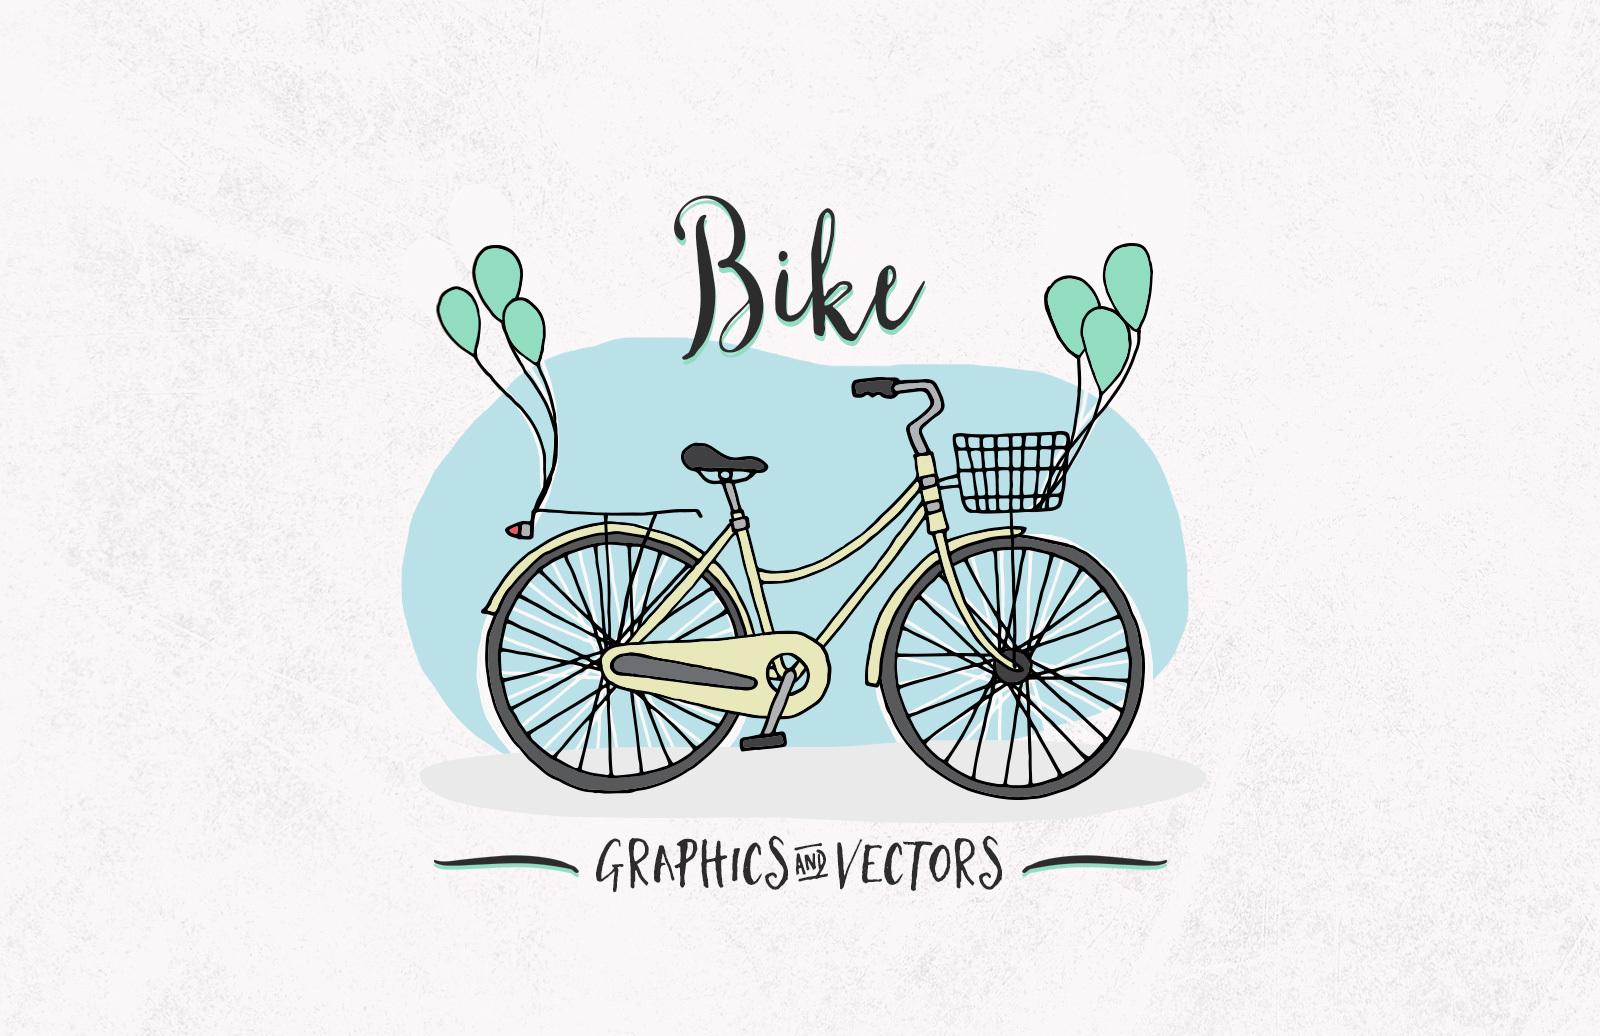 Bike Graphics & Vectors